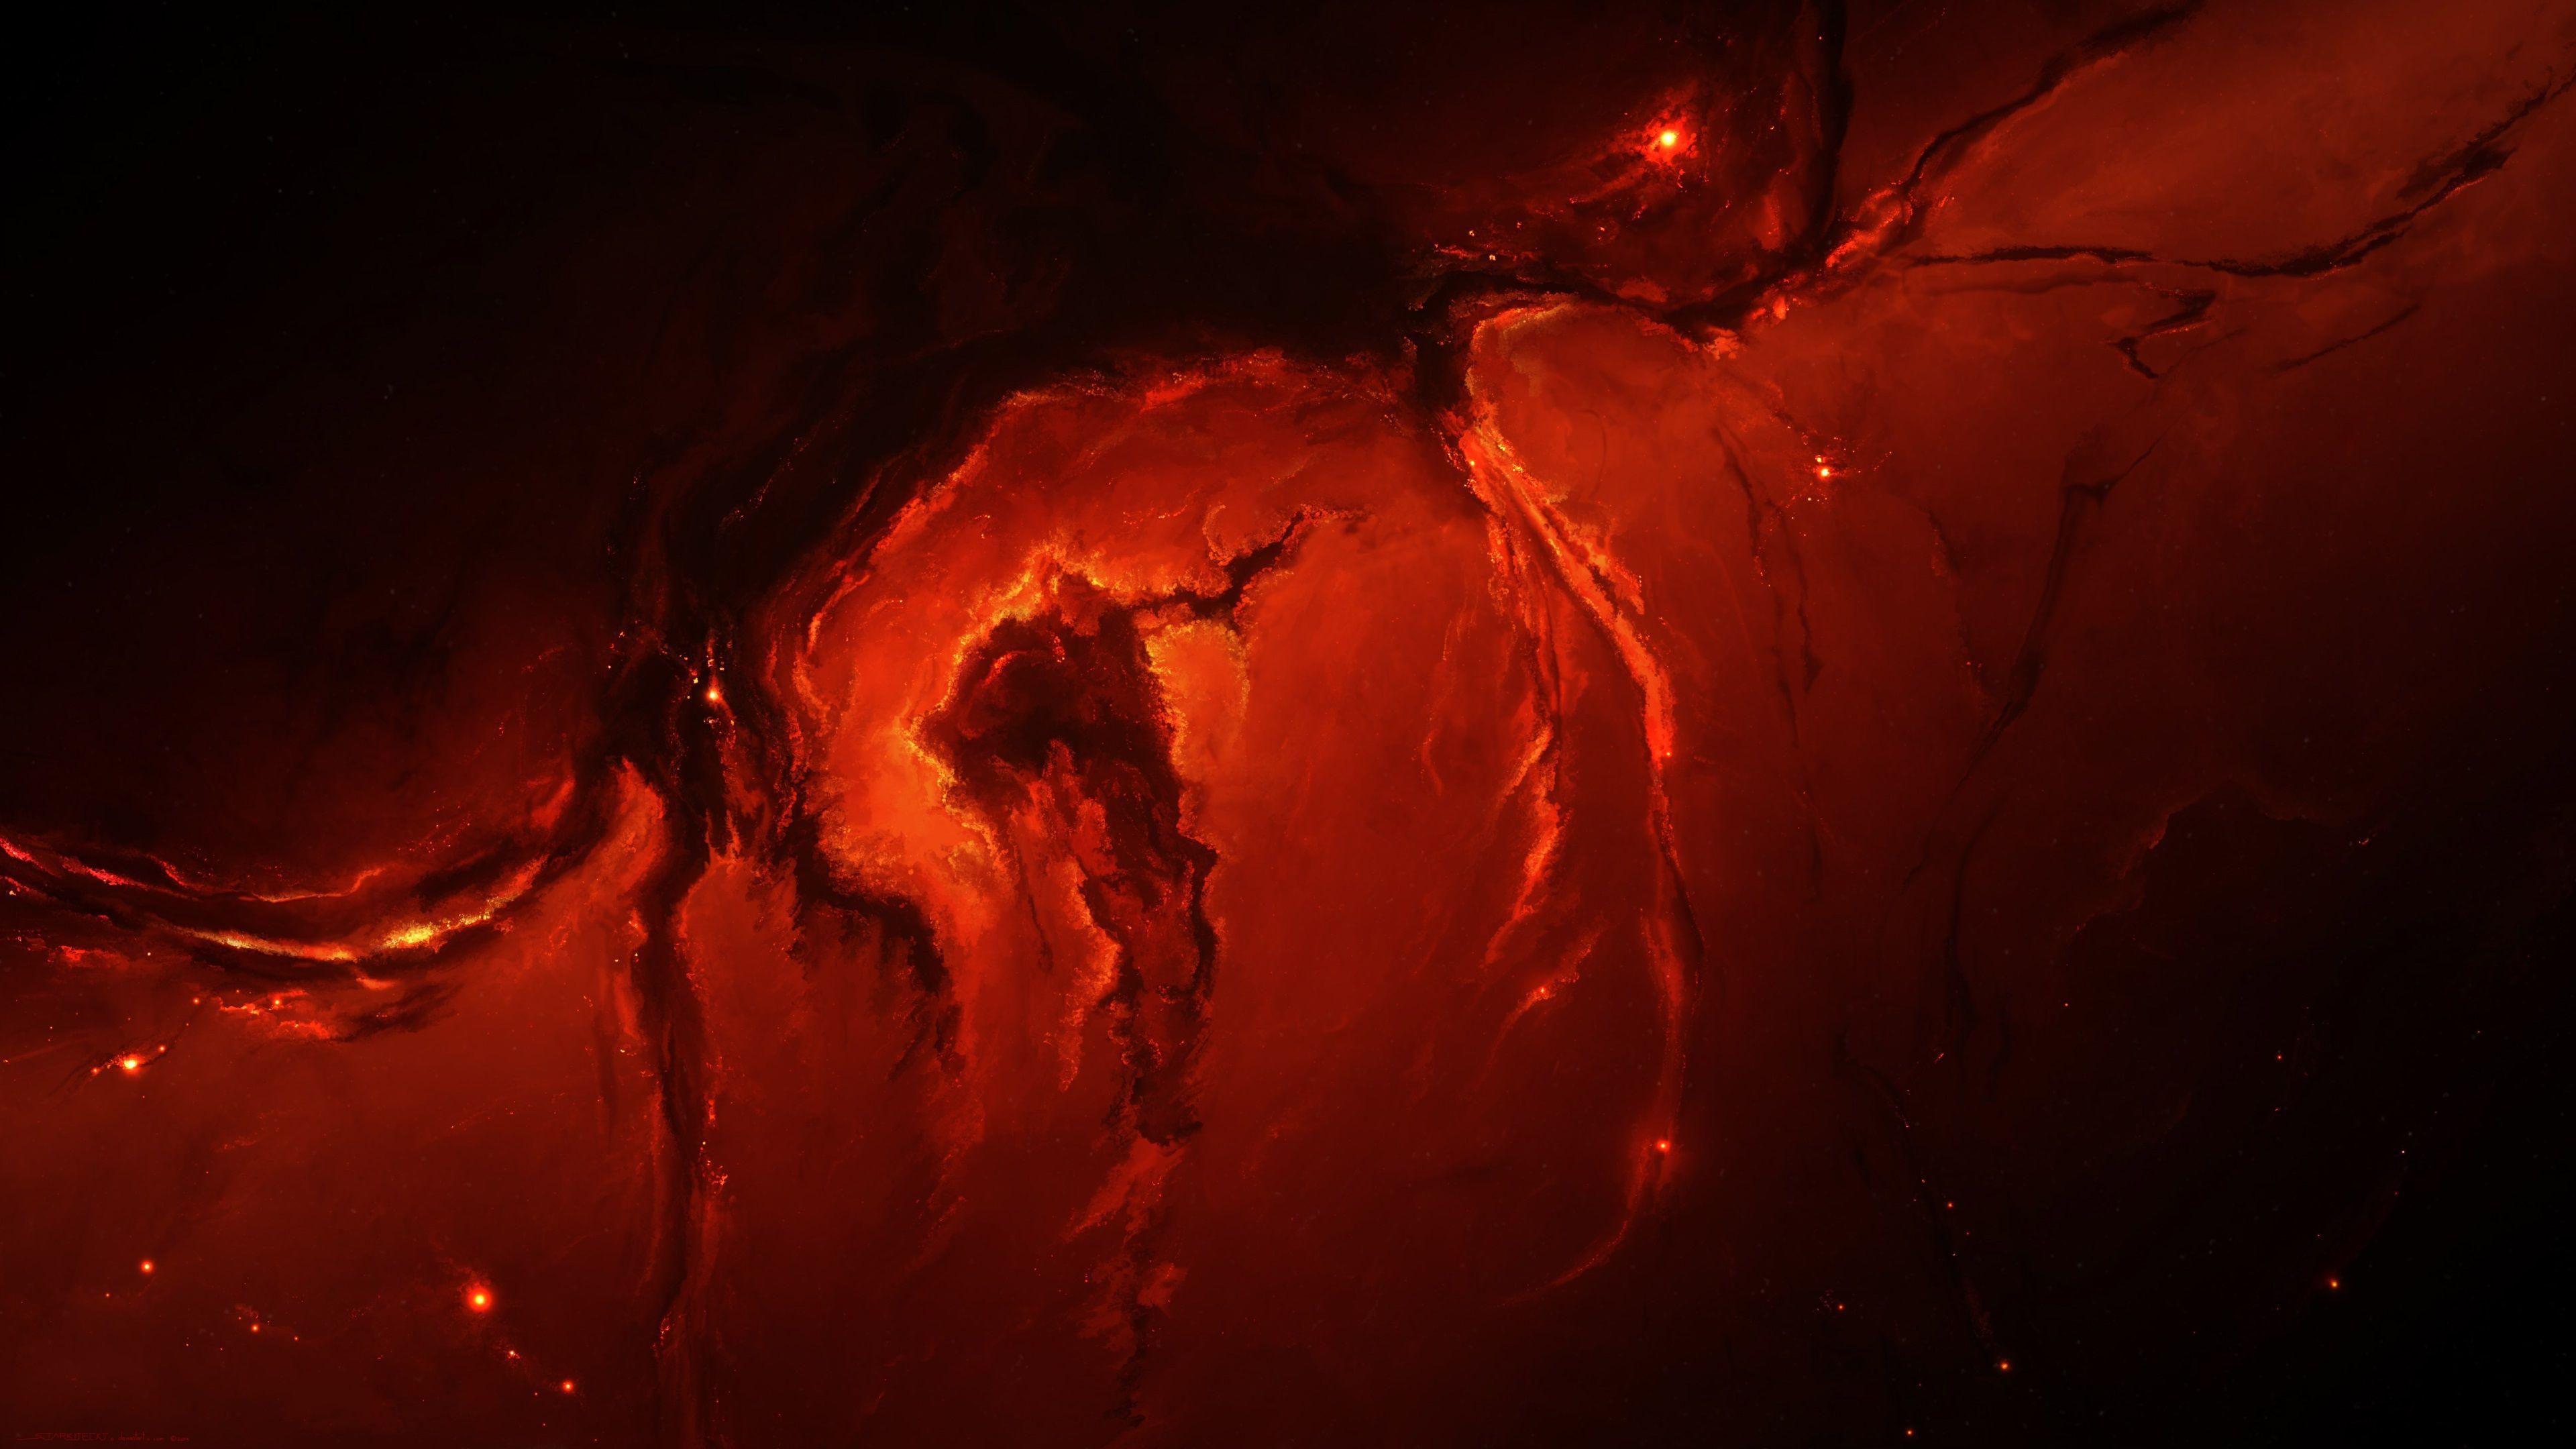 3840x2160 Fire 4k Background Wallpaper Nebula Wallpaper Space Art 4k Background